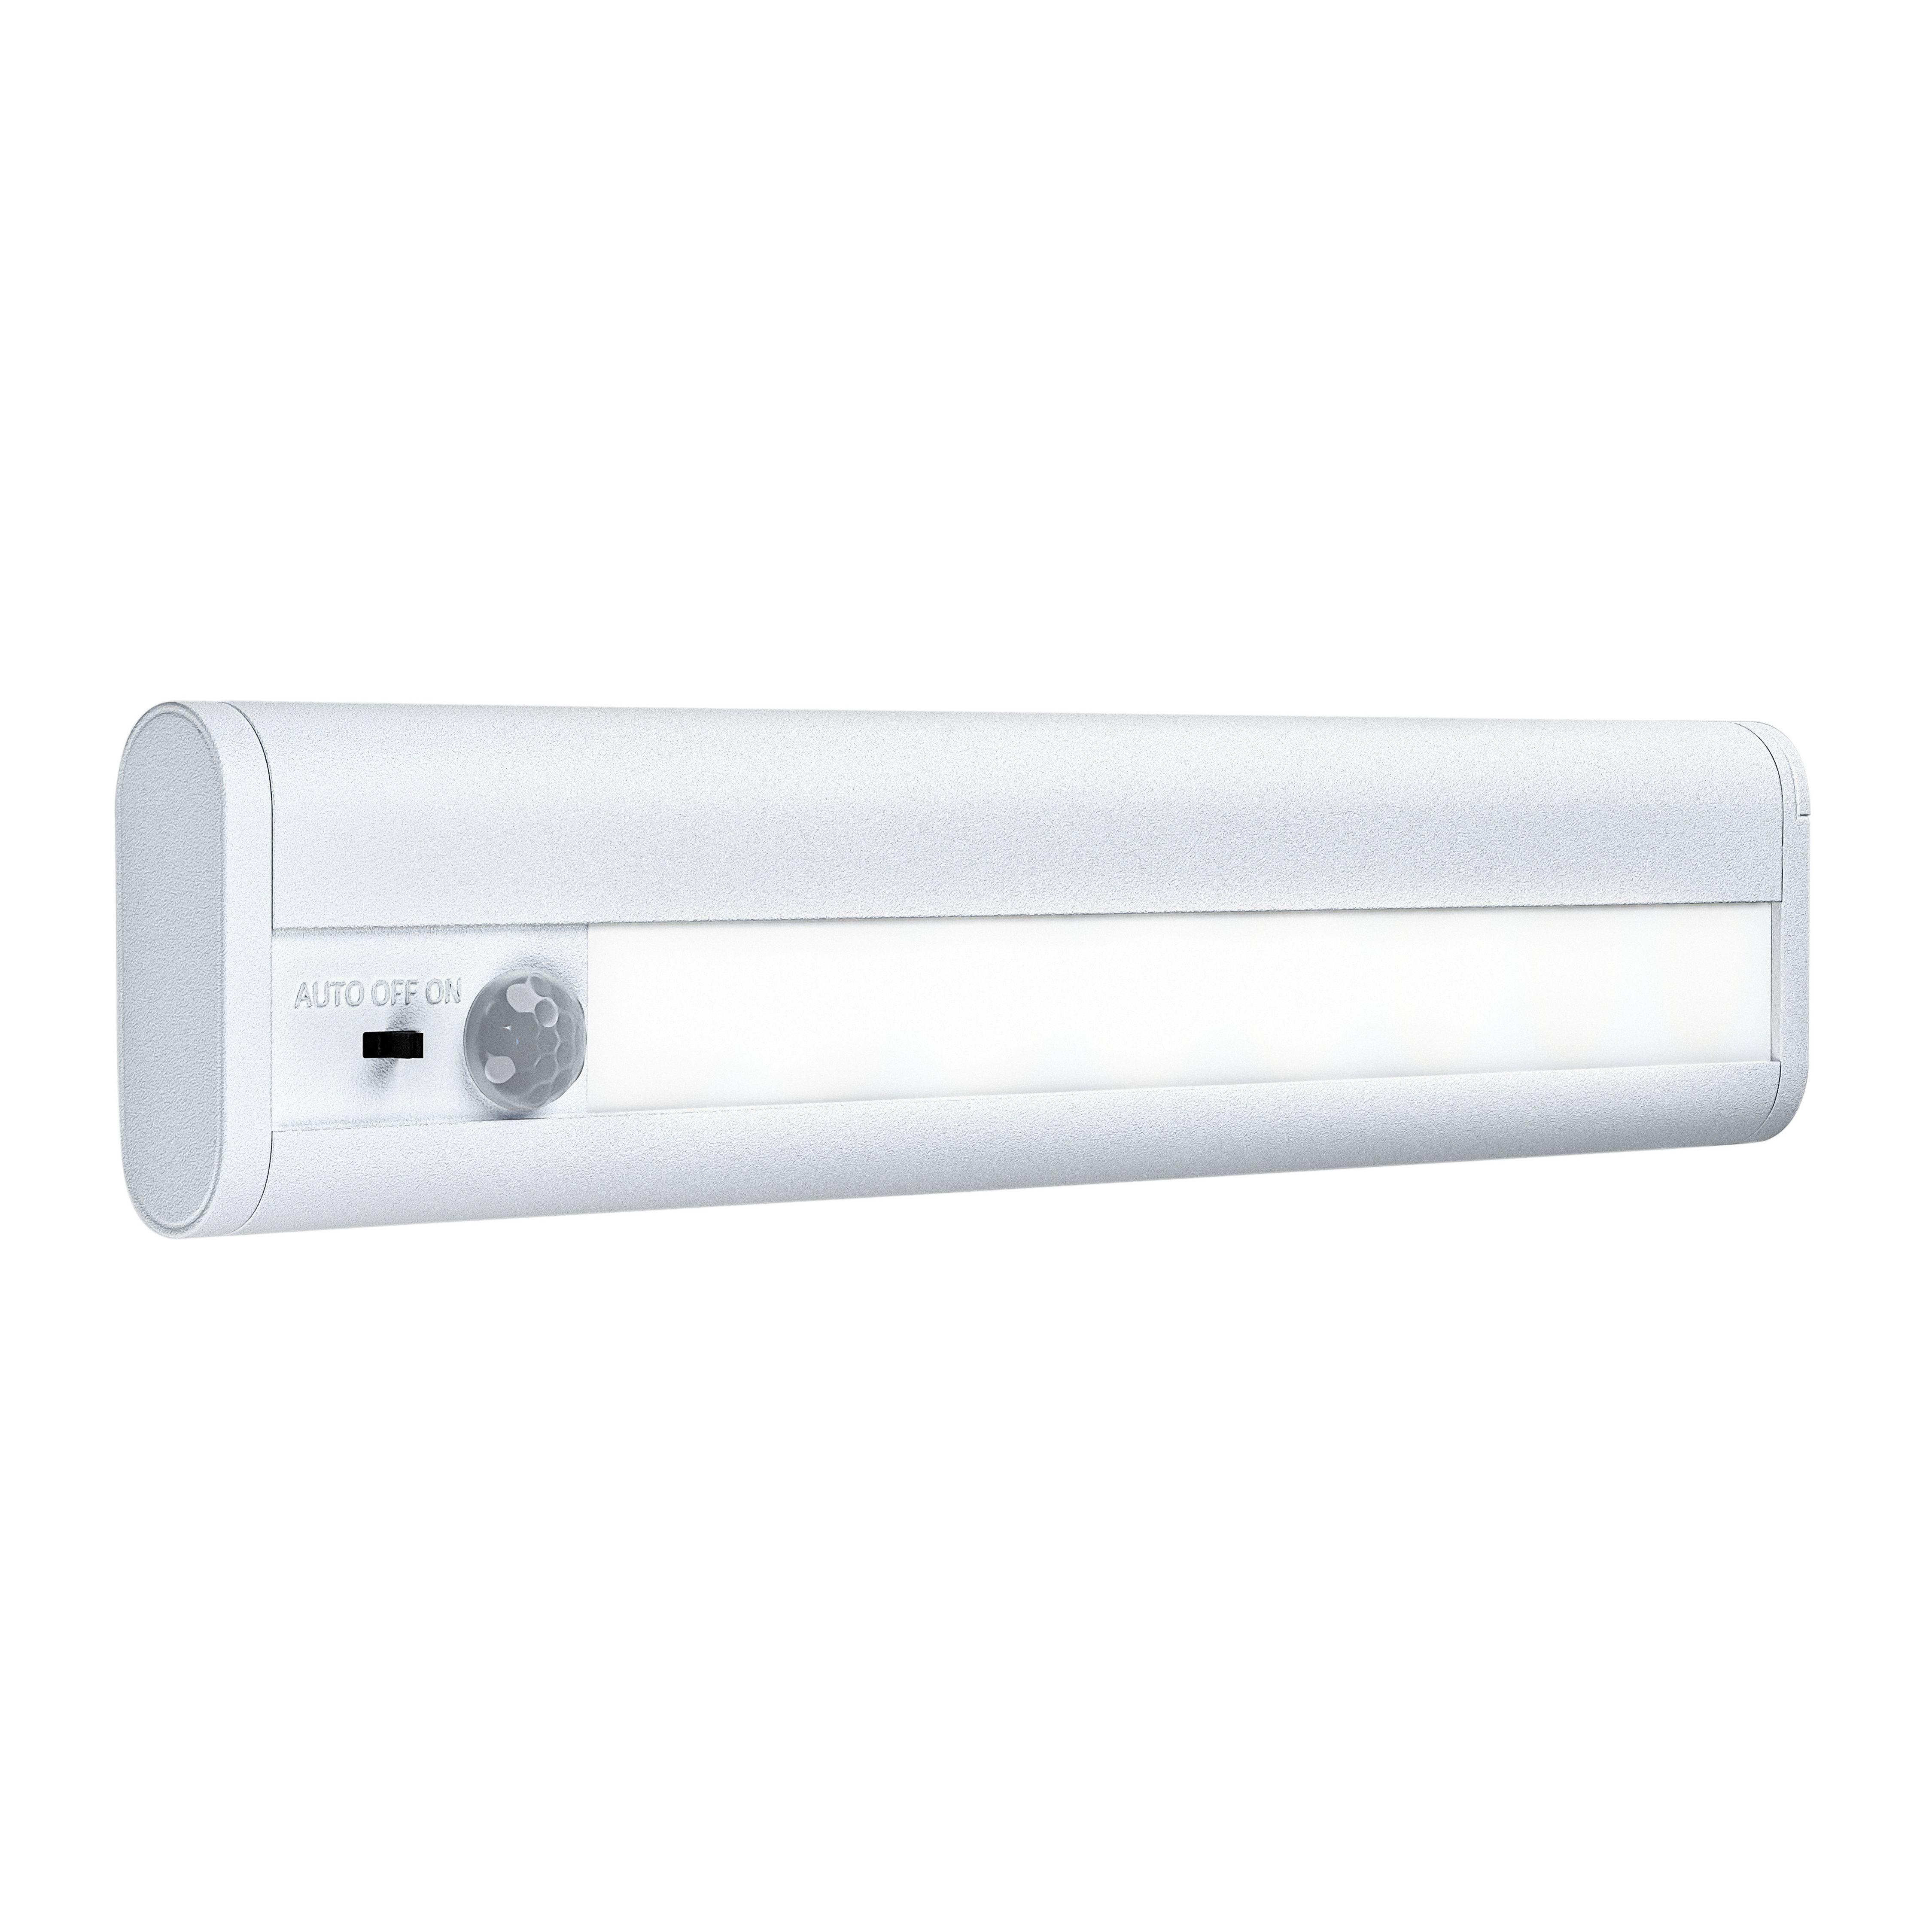 Osram Batteriebetriebene Sensor LED-Unterbauleuchte / 20cm »LinearLED Mobile 200«